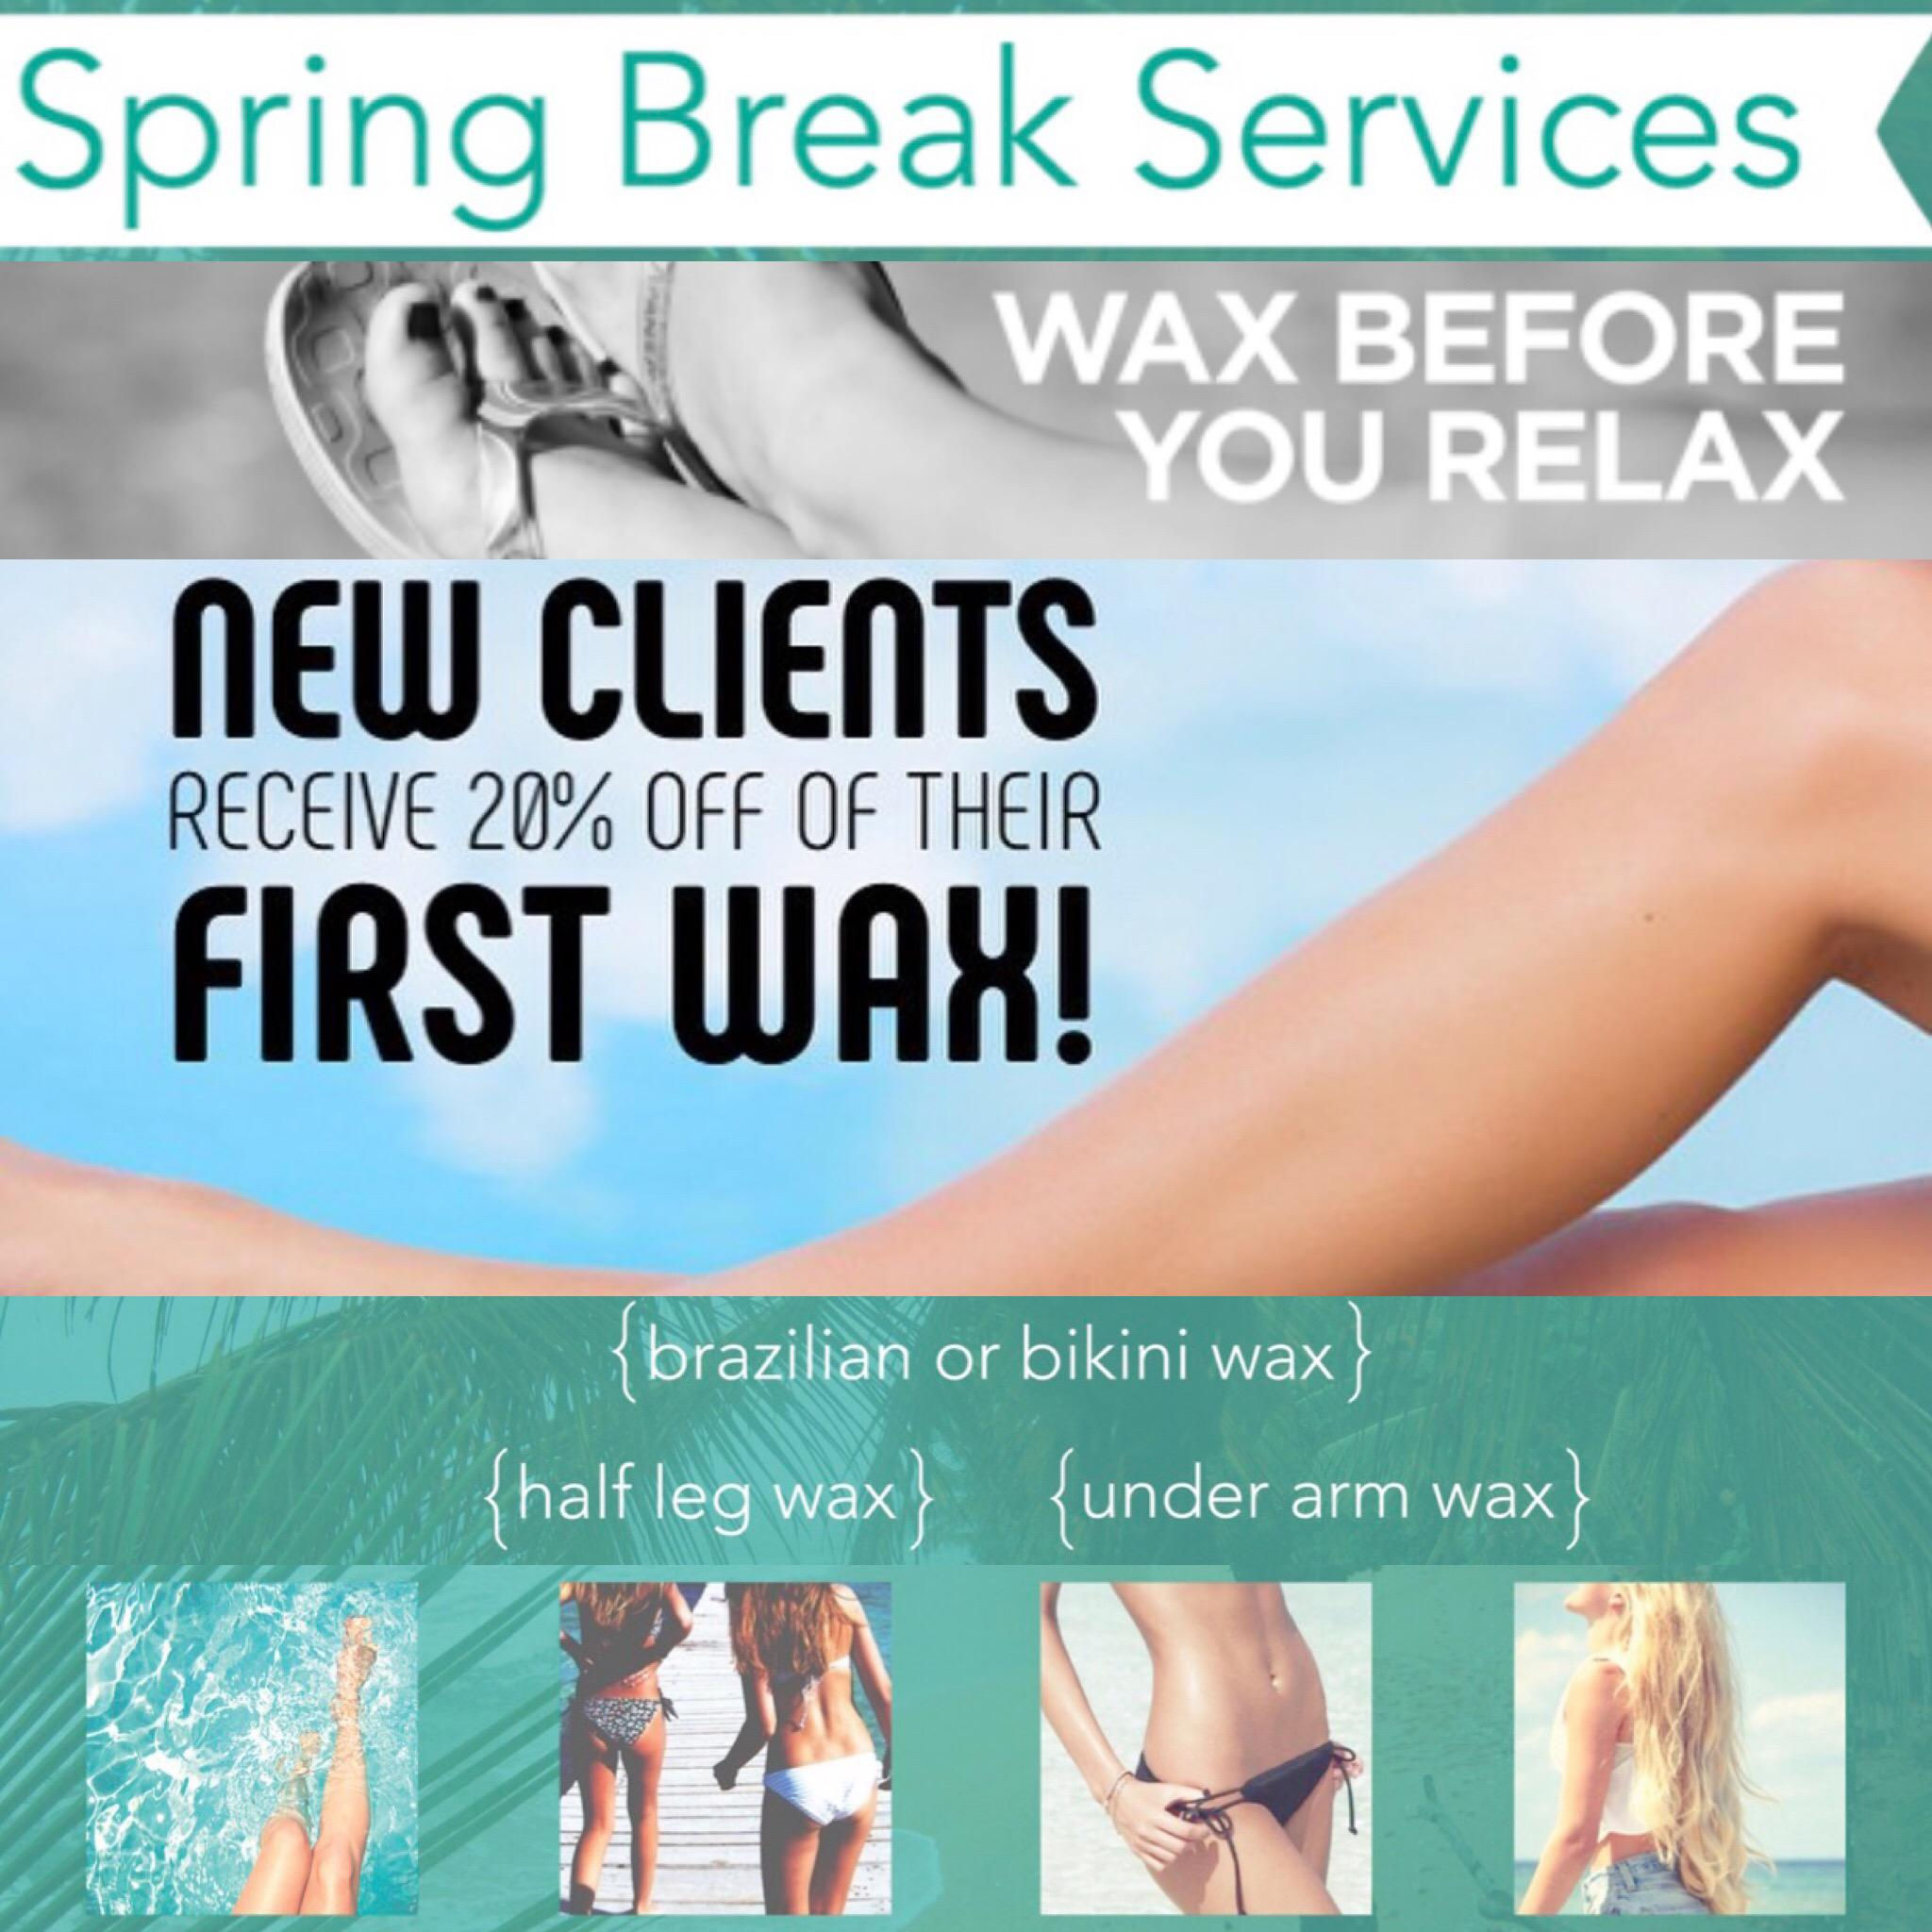 Bodyscapes Salon & Beauty Spa image 5